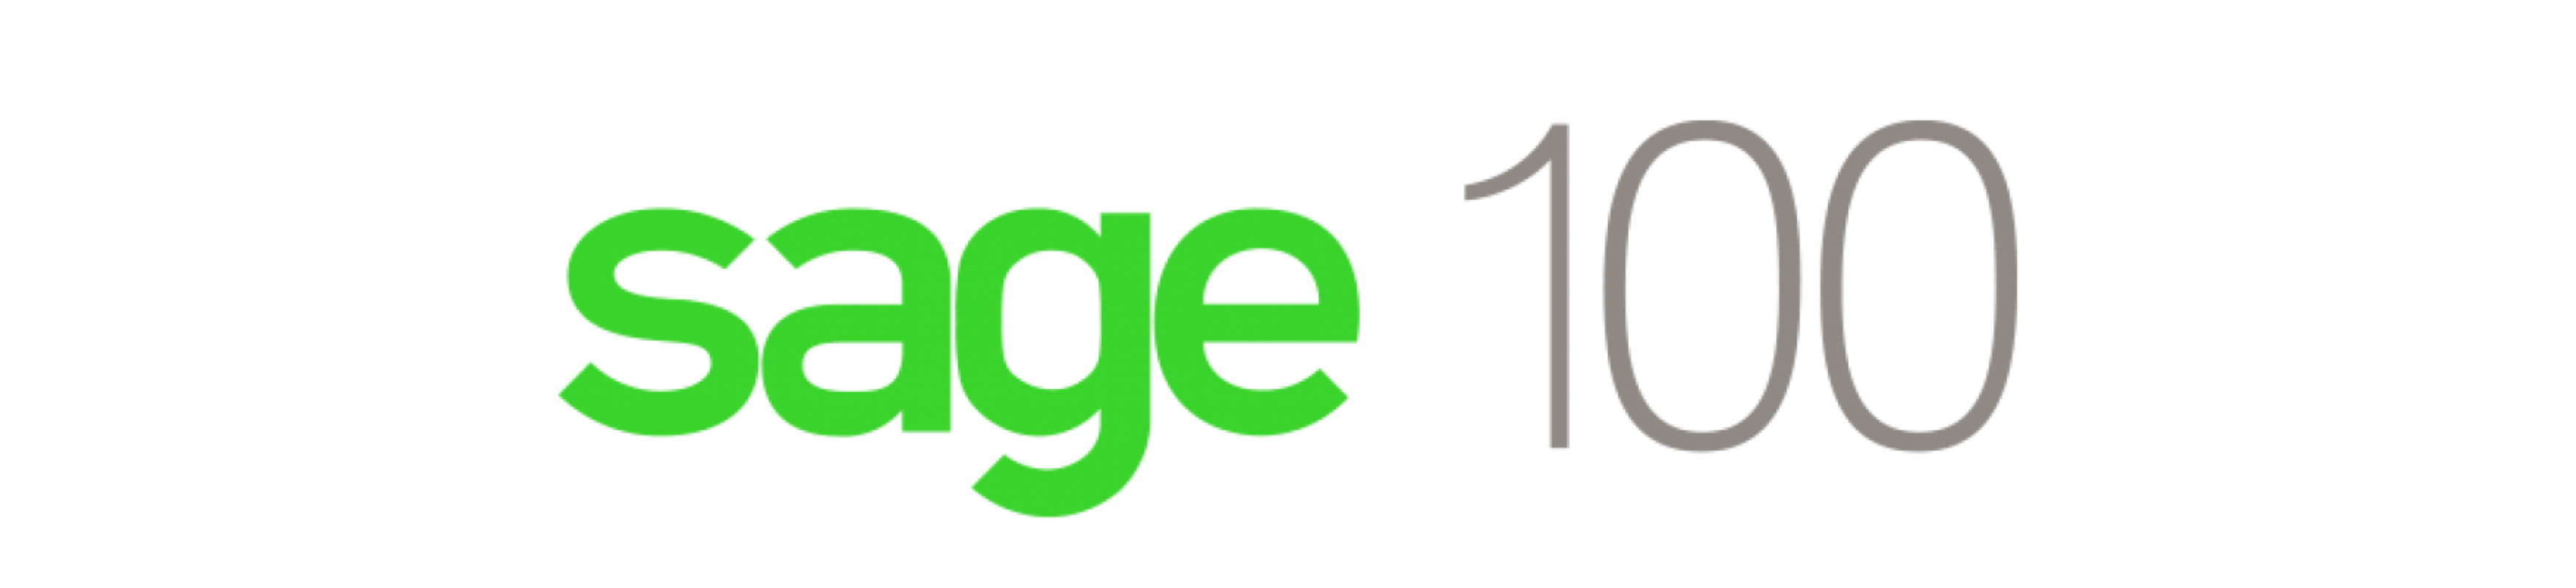 sage-100-followup-crm-integration